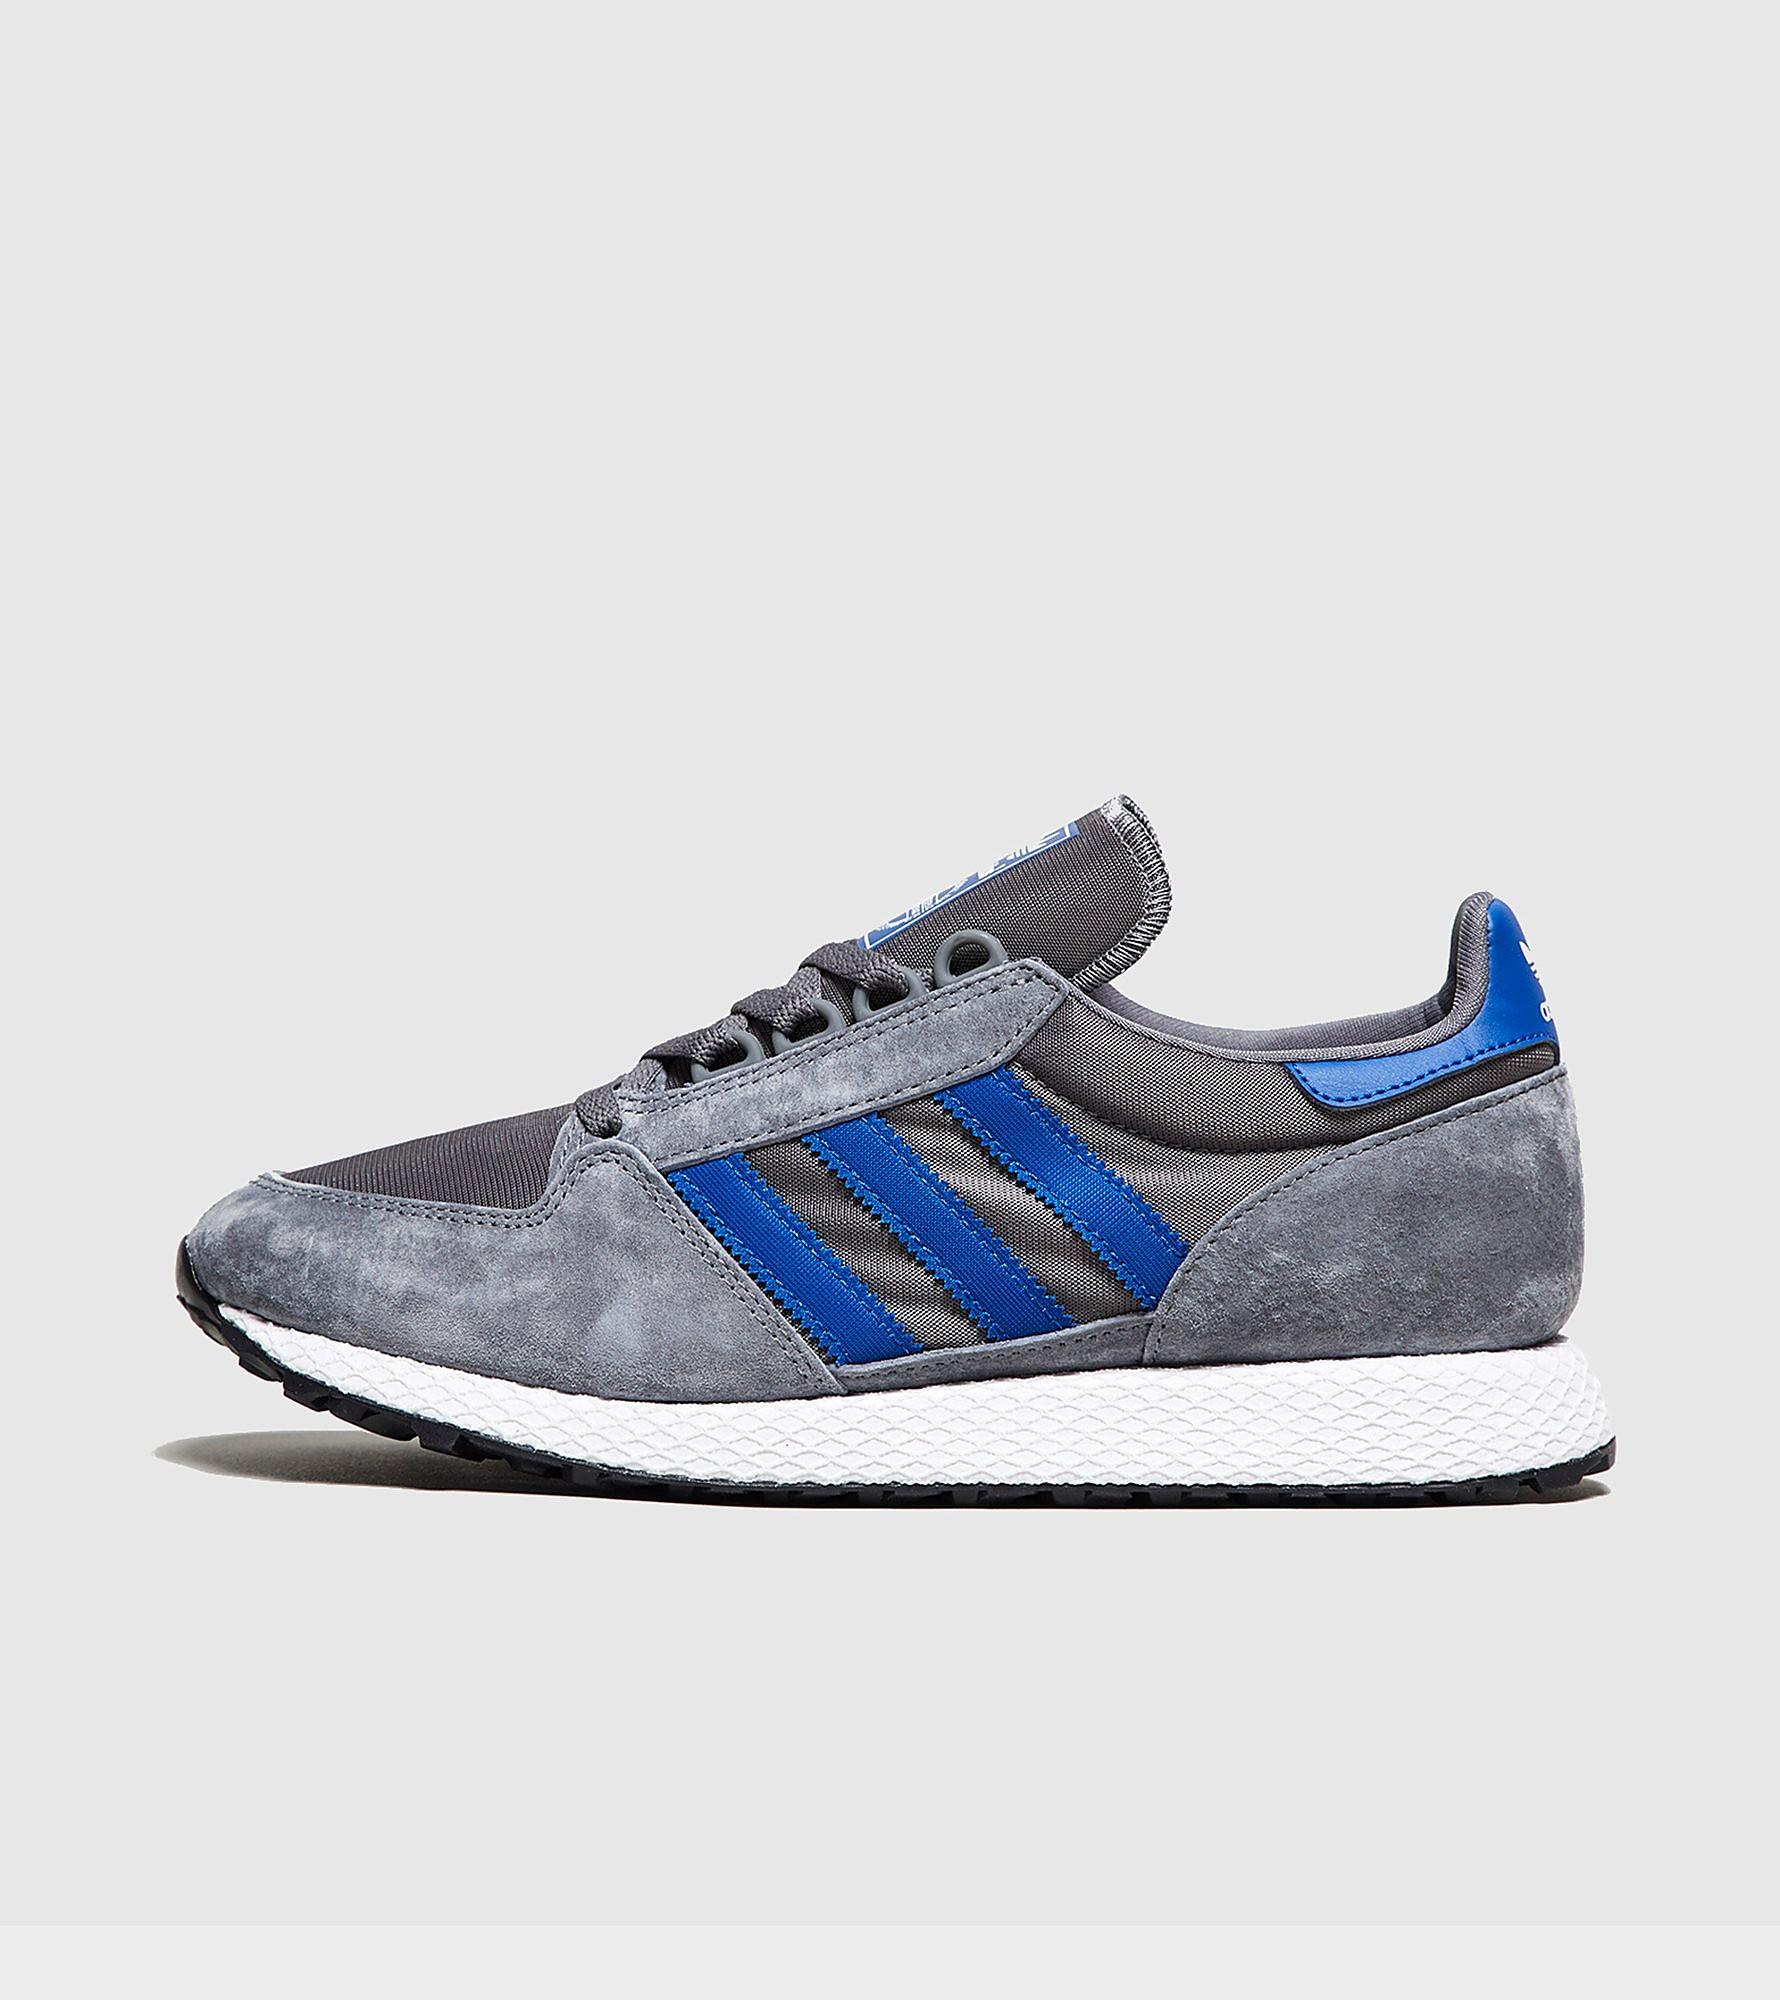 Adidas Originali Calzature Uomo Taglia?